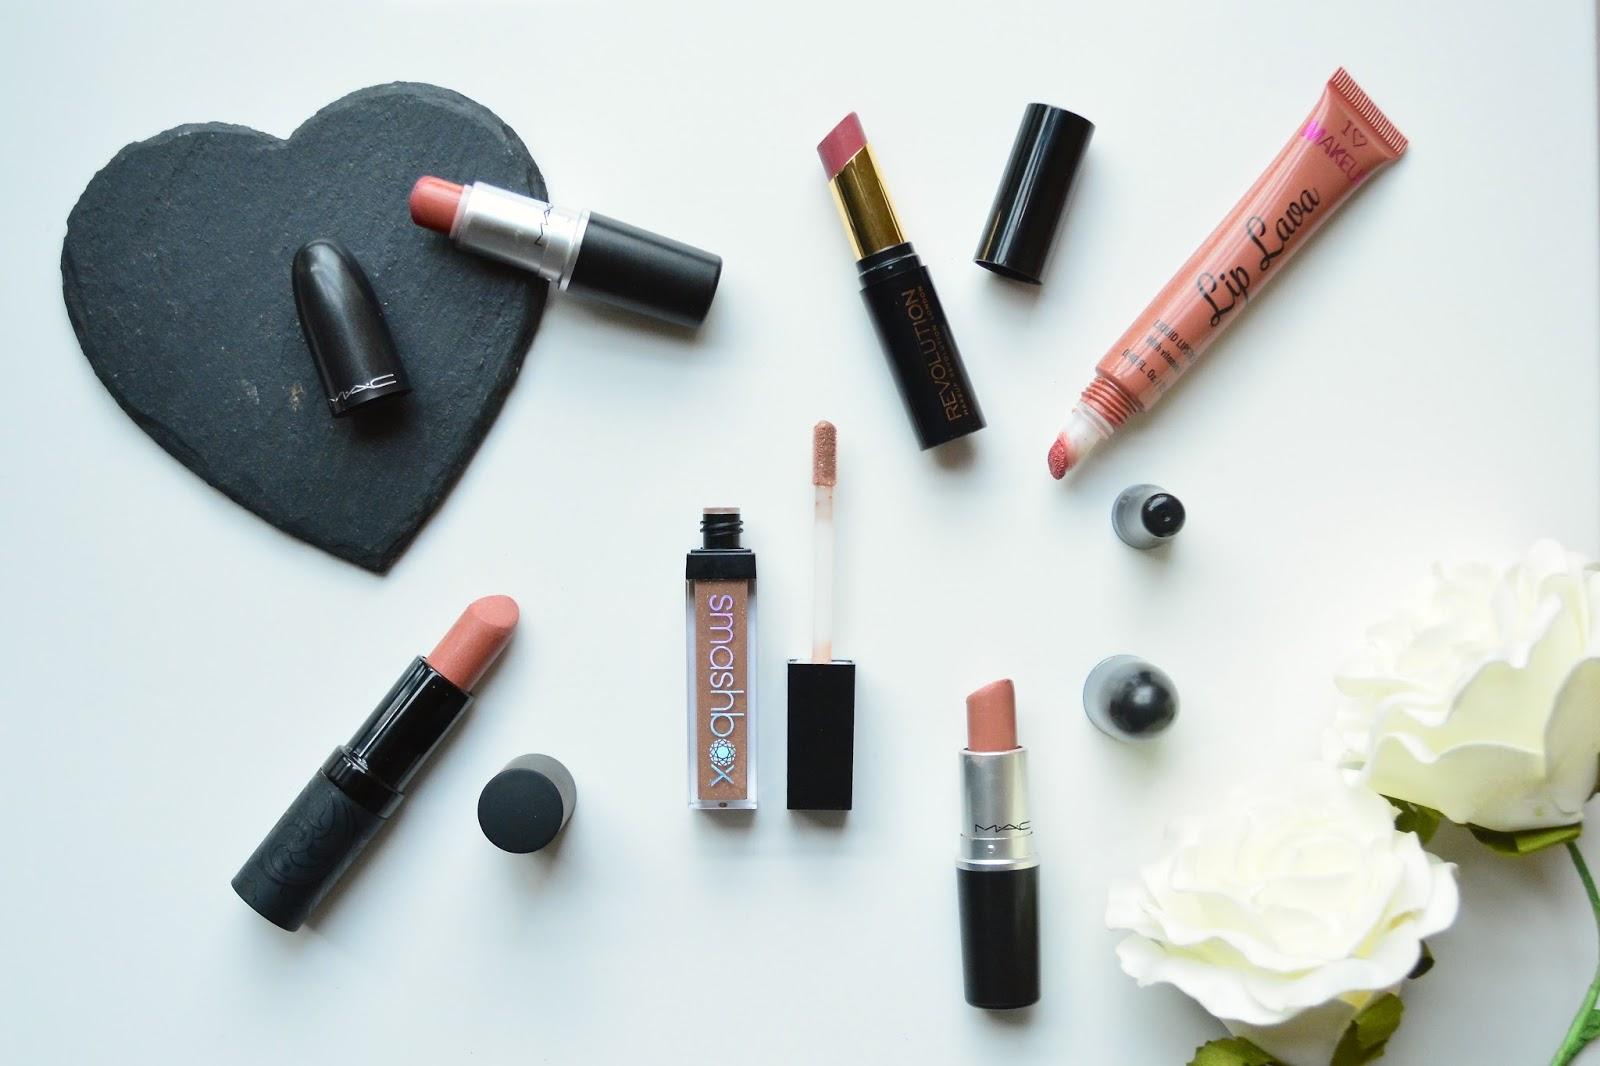 Mac, Mac Lipstick, MAC Velvet Teddy, Mac Honeylove, Makeup Revolution Lip Lava, Smashbox Lip Gloss Jewel, MeMeMe Persian Pink Lipstick, Nude Lipsticks, Makeup Revolution Lip Hug, Nude Lipstick Swatches